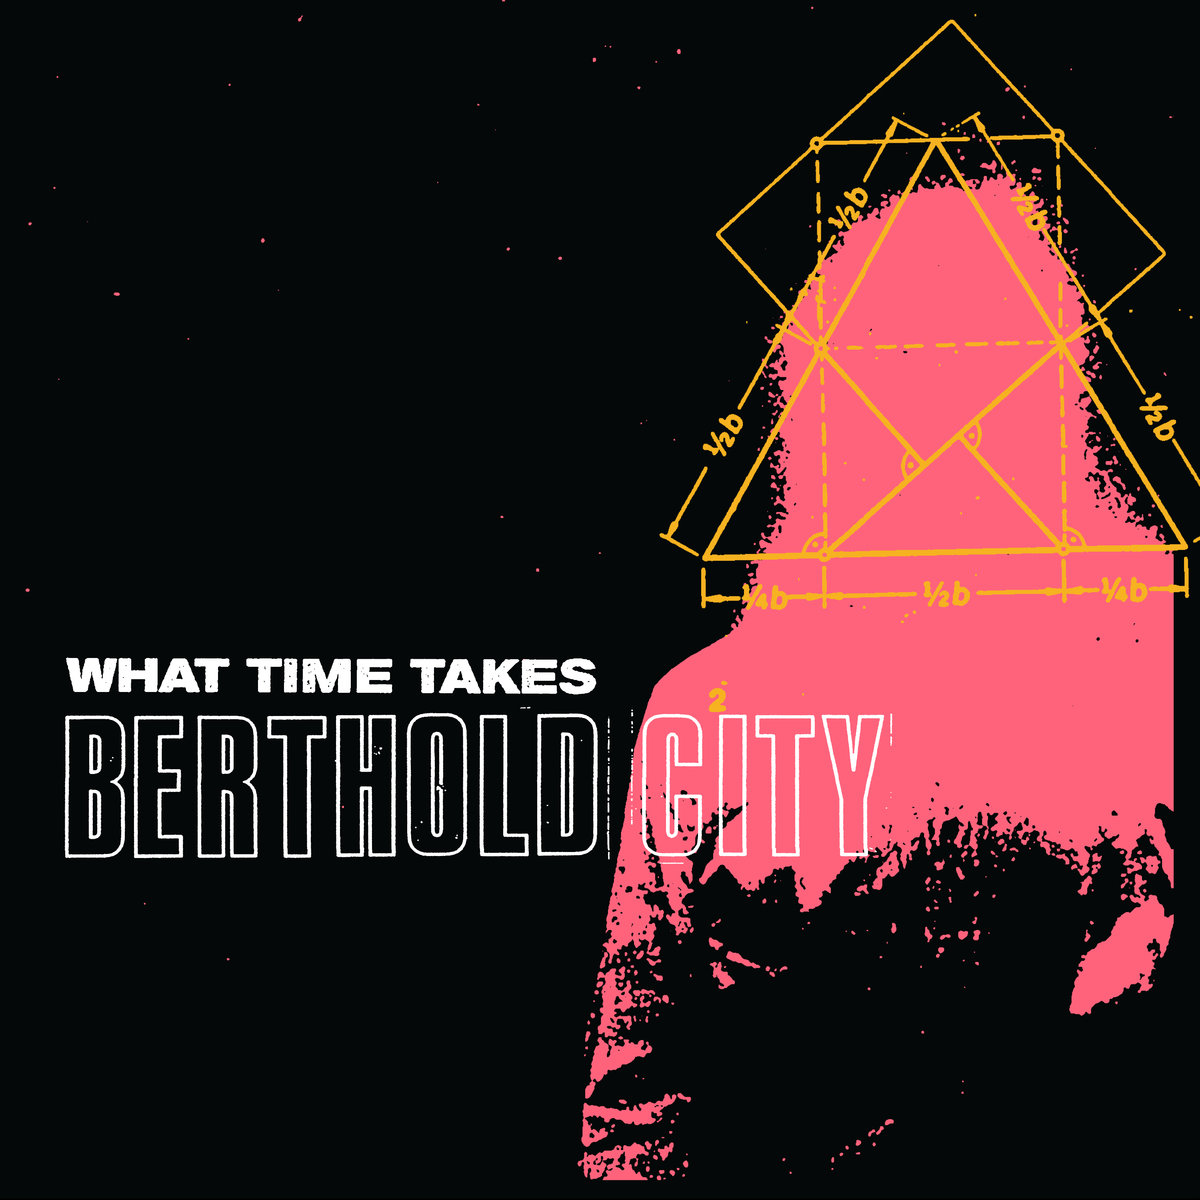 BERTHOLD CITY